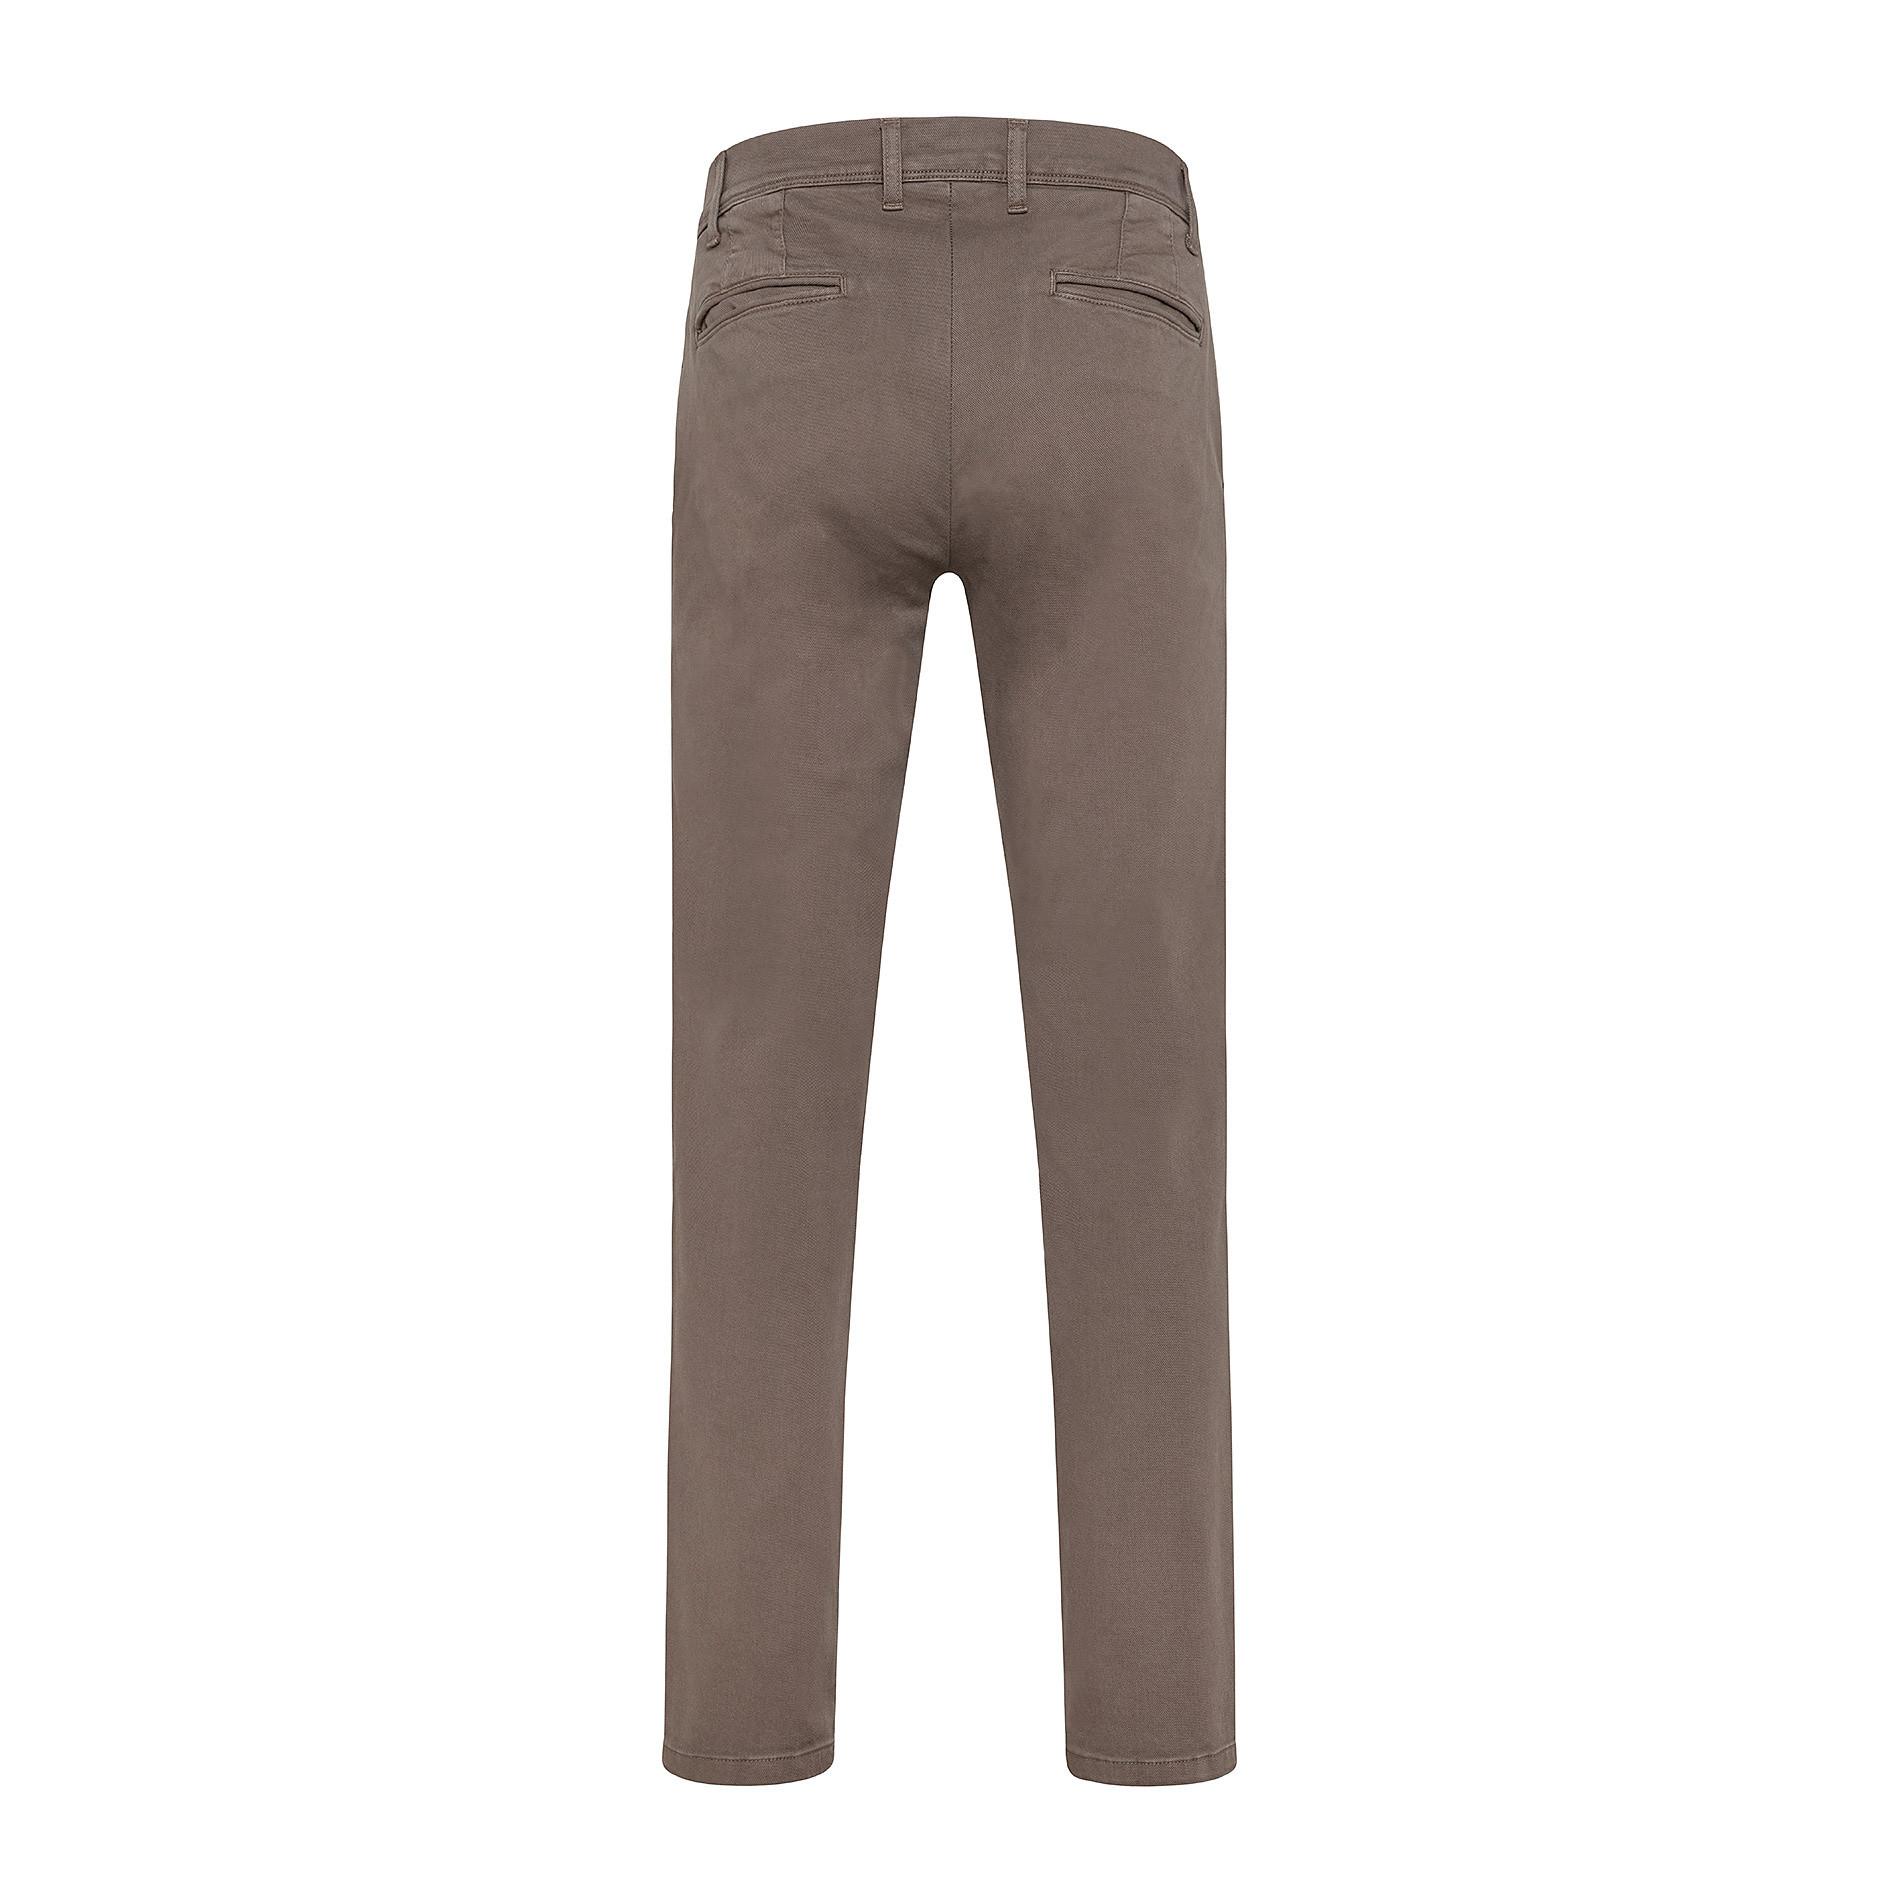 Pantalone chino gabardina stretch JCT, Beige, large image number 1